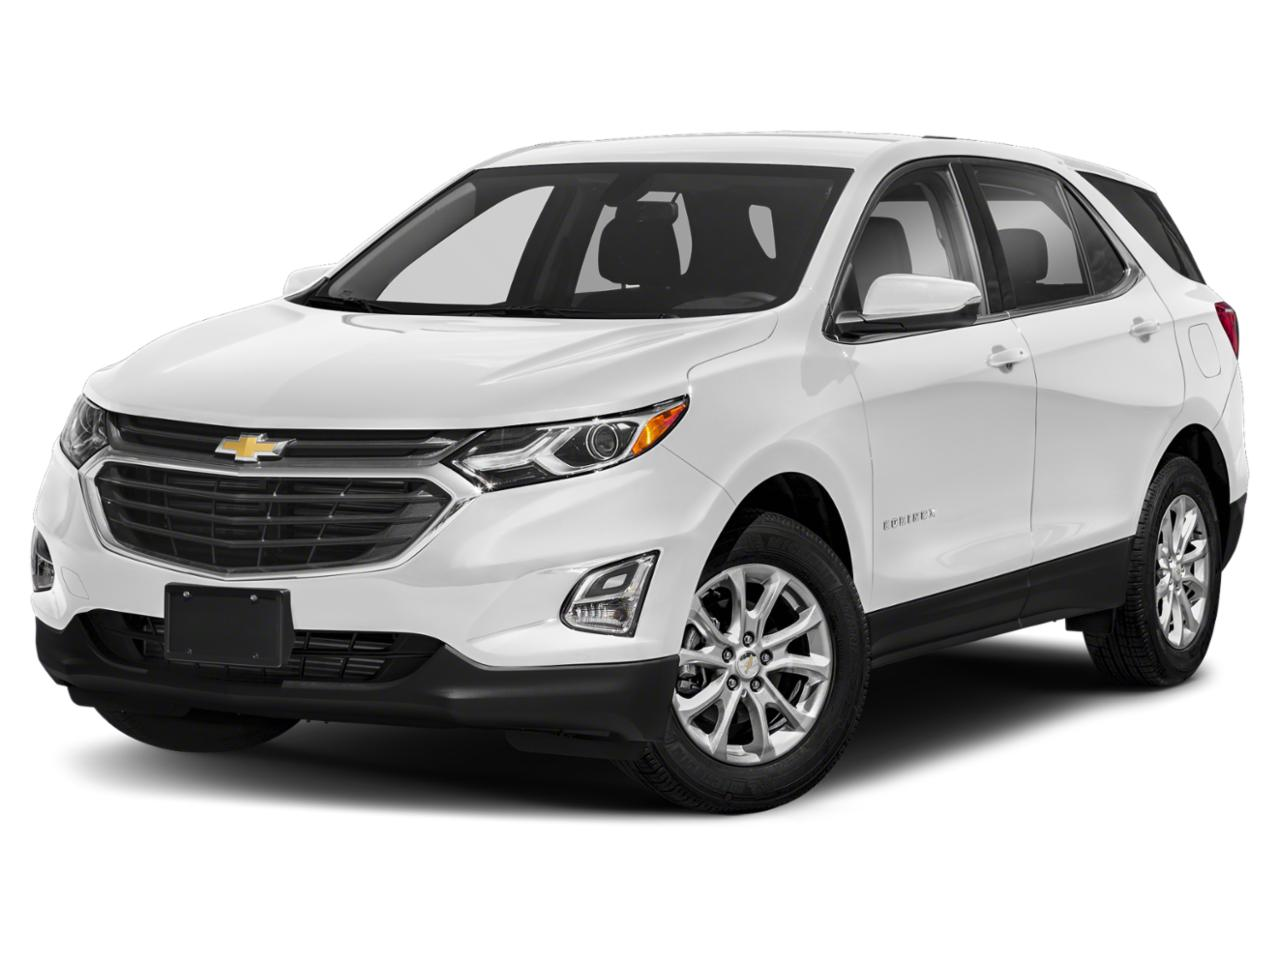 2018 Chevrolet Equinox Vehicle Photo in Peoria, IL 61615